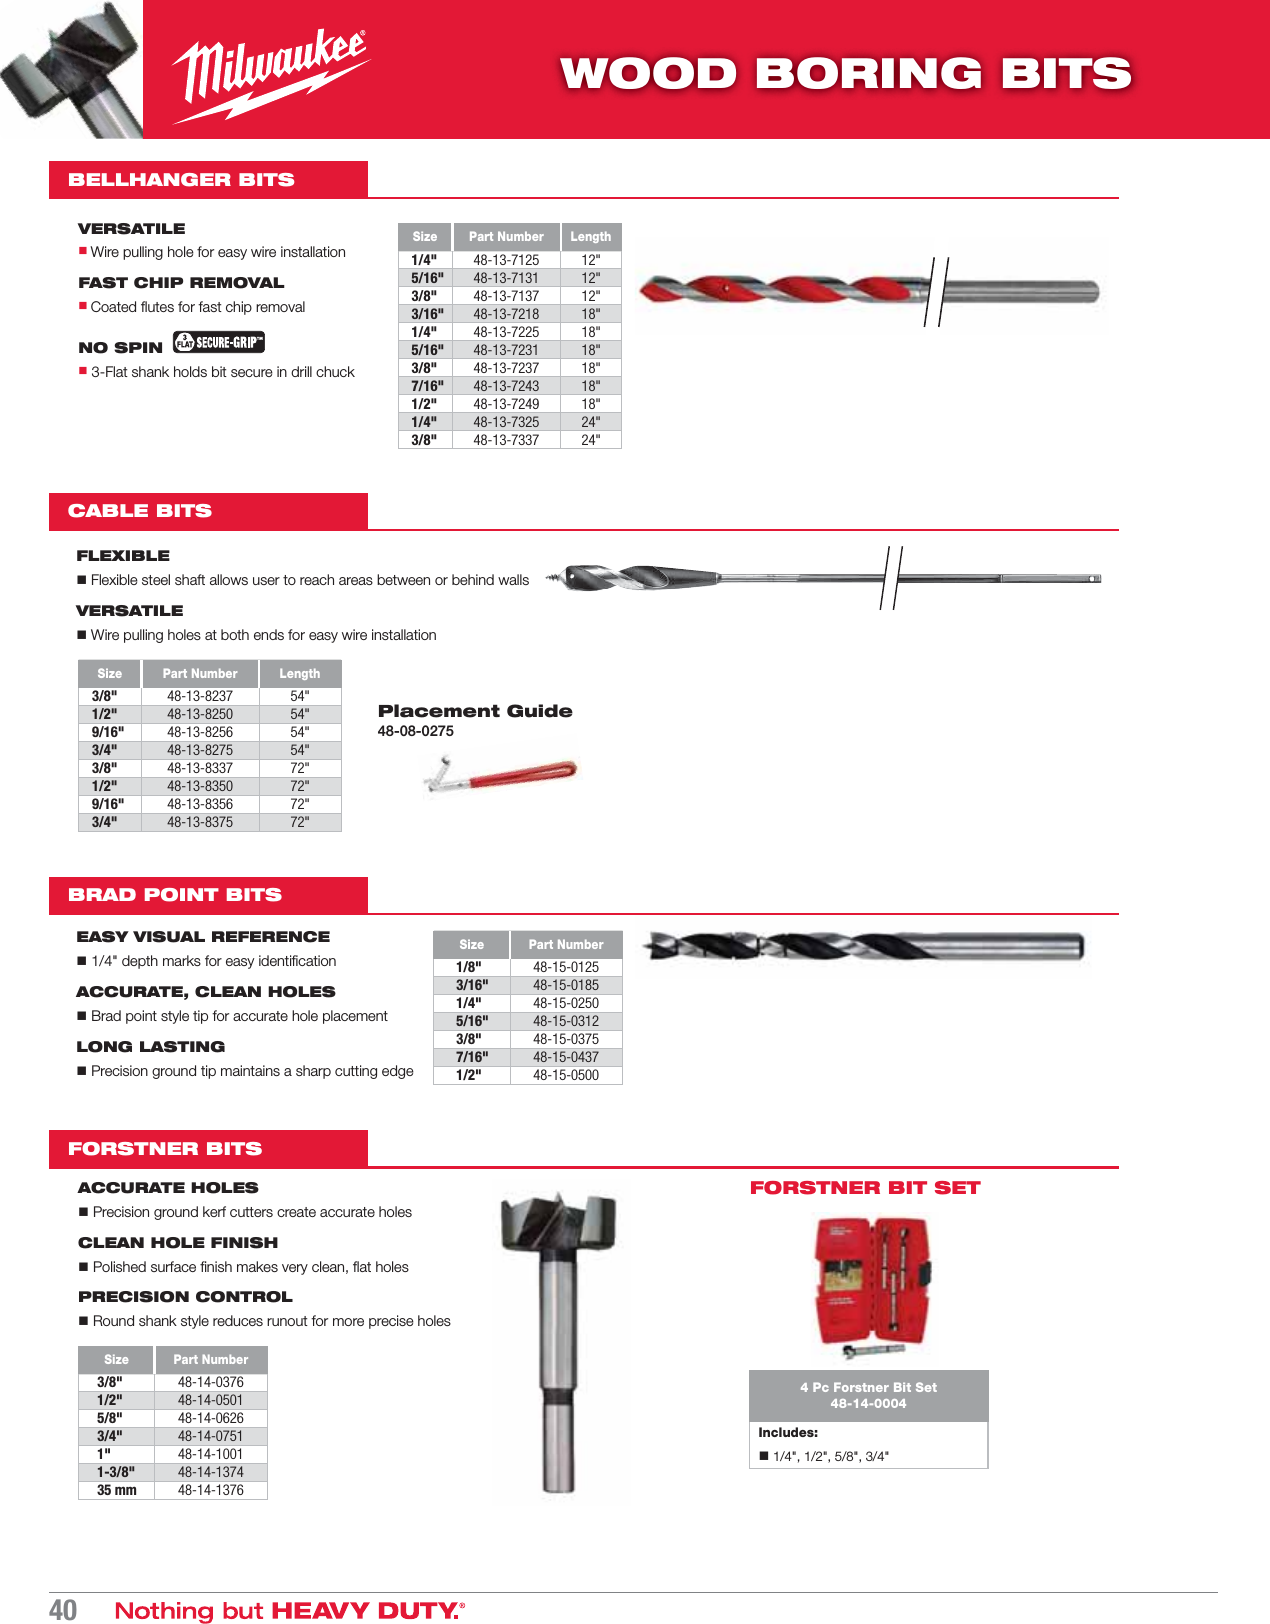 1.16 mm Cutting Diameter 38 mm Length 2 Flutes Carbide Altin 10.20 mm Cutting Length 3 mm Shank Diameter KYOCERA 226-0457L400 Series 226 Micro Drill Bit 130 Degree Cutting Angle